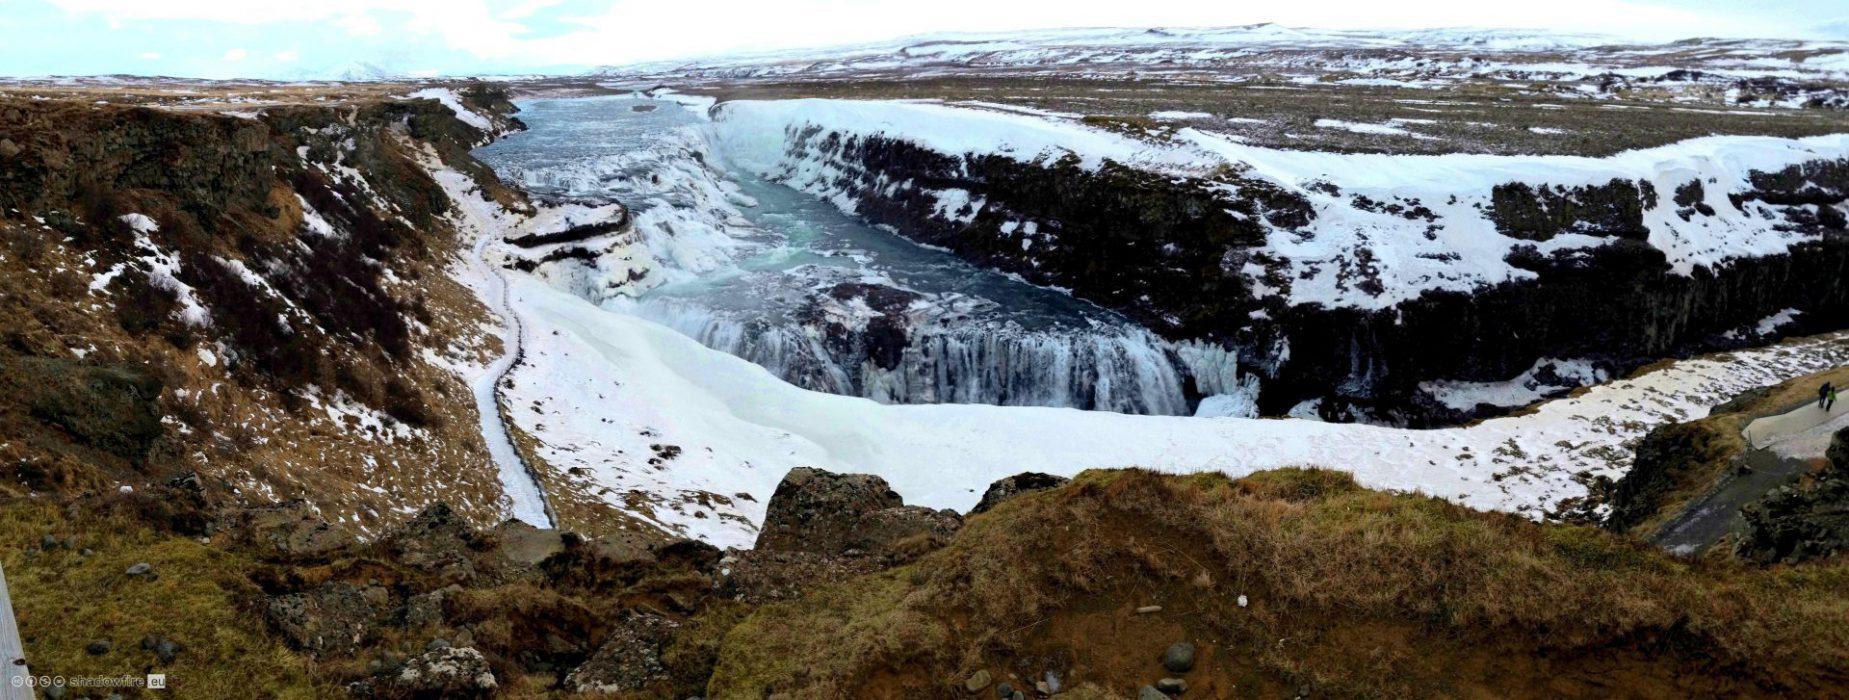 Iceland, Sudurland, Gullfoss